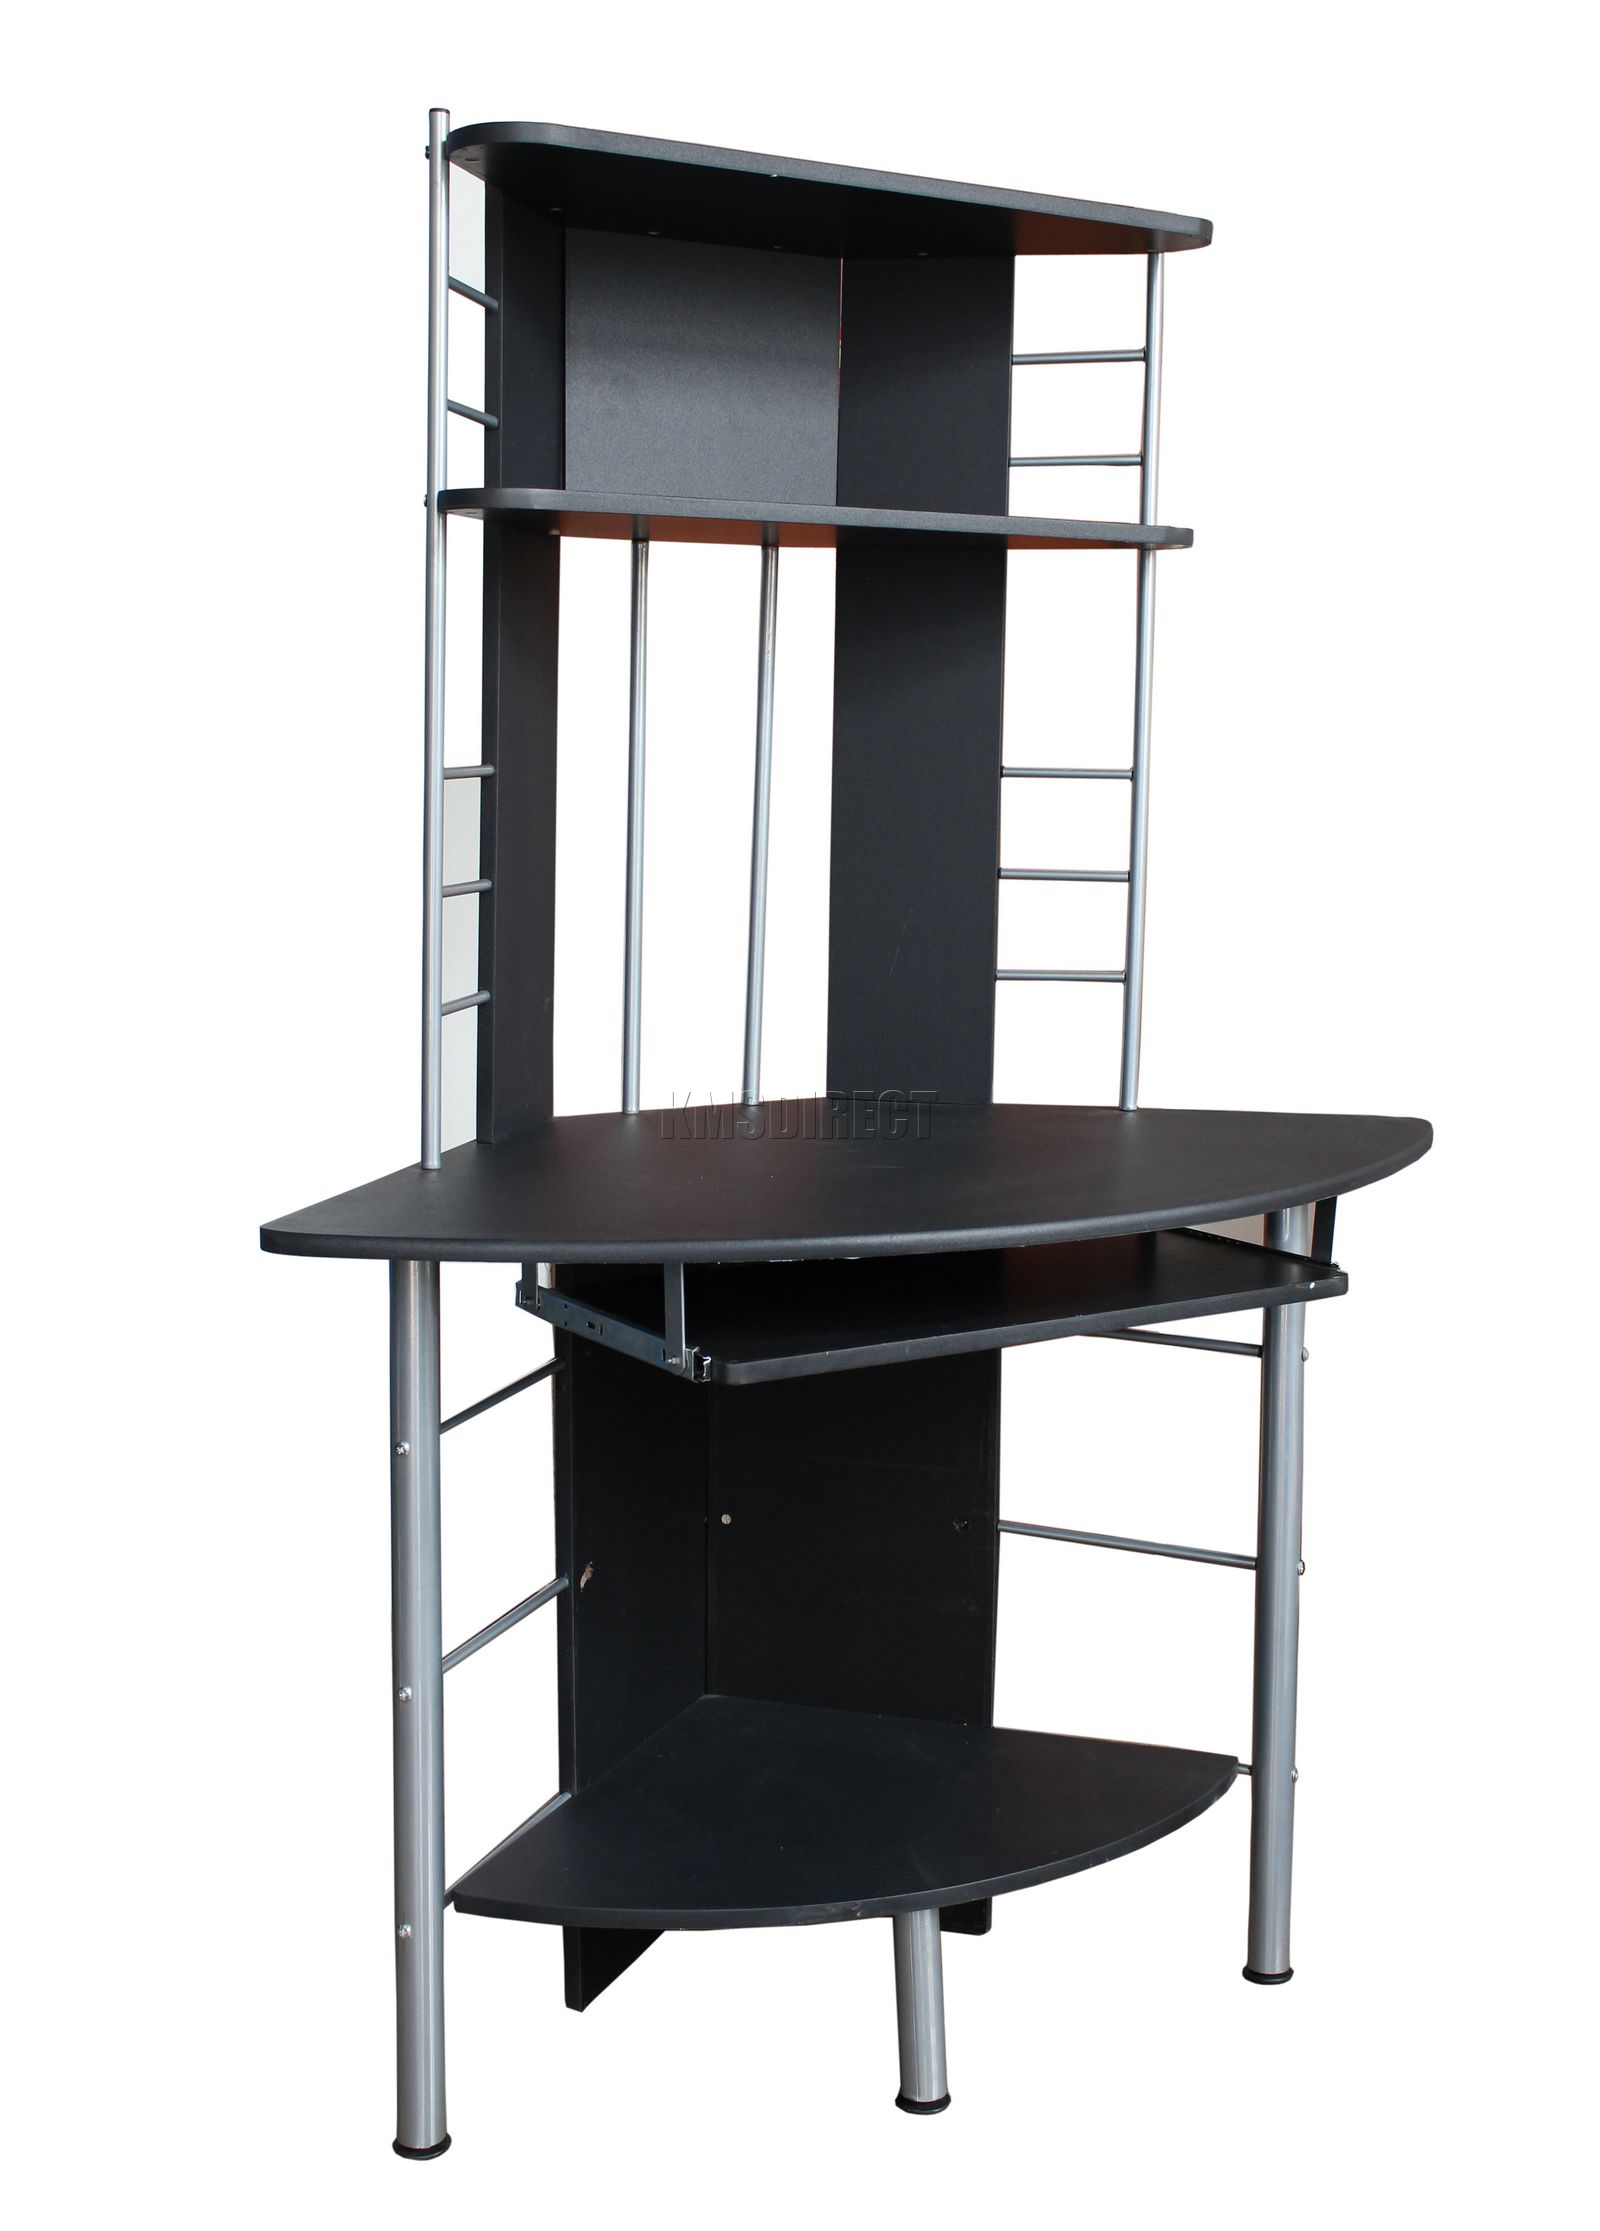 Computer Desk Home Office Table PC Work Station Corner Unit Furniture